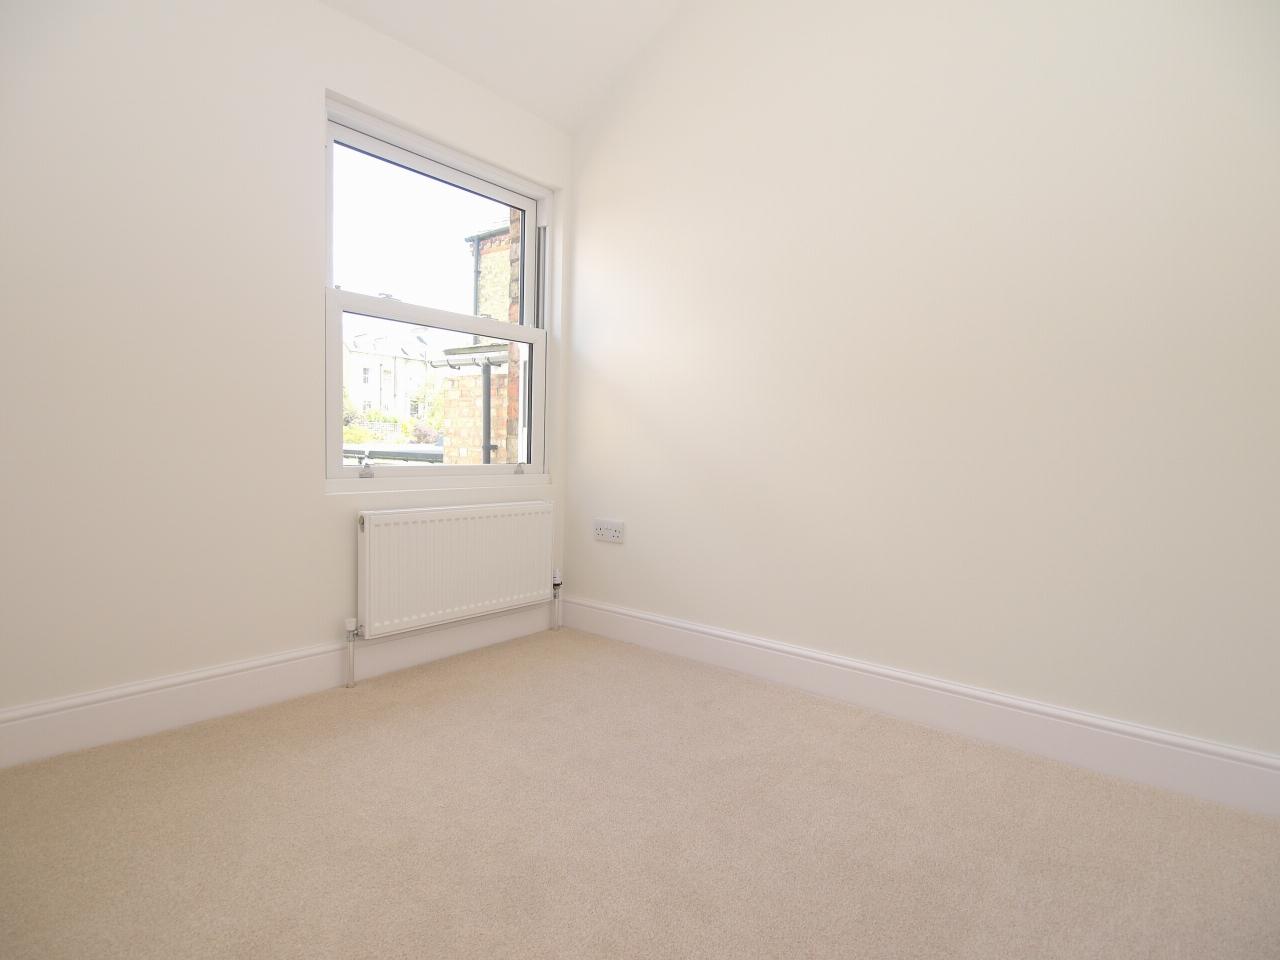 2 bedroom mid terraced house Sold in Sevenoaks - Photograph 10